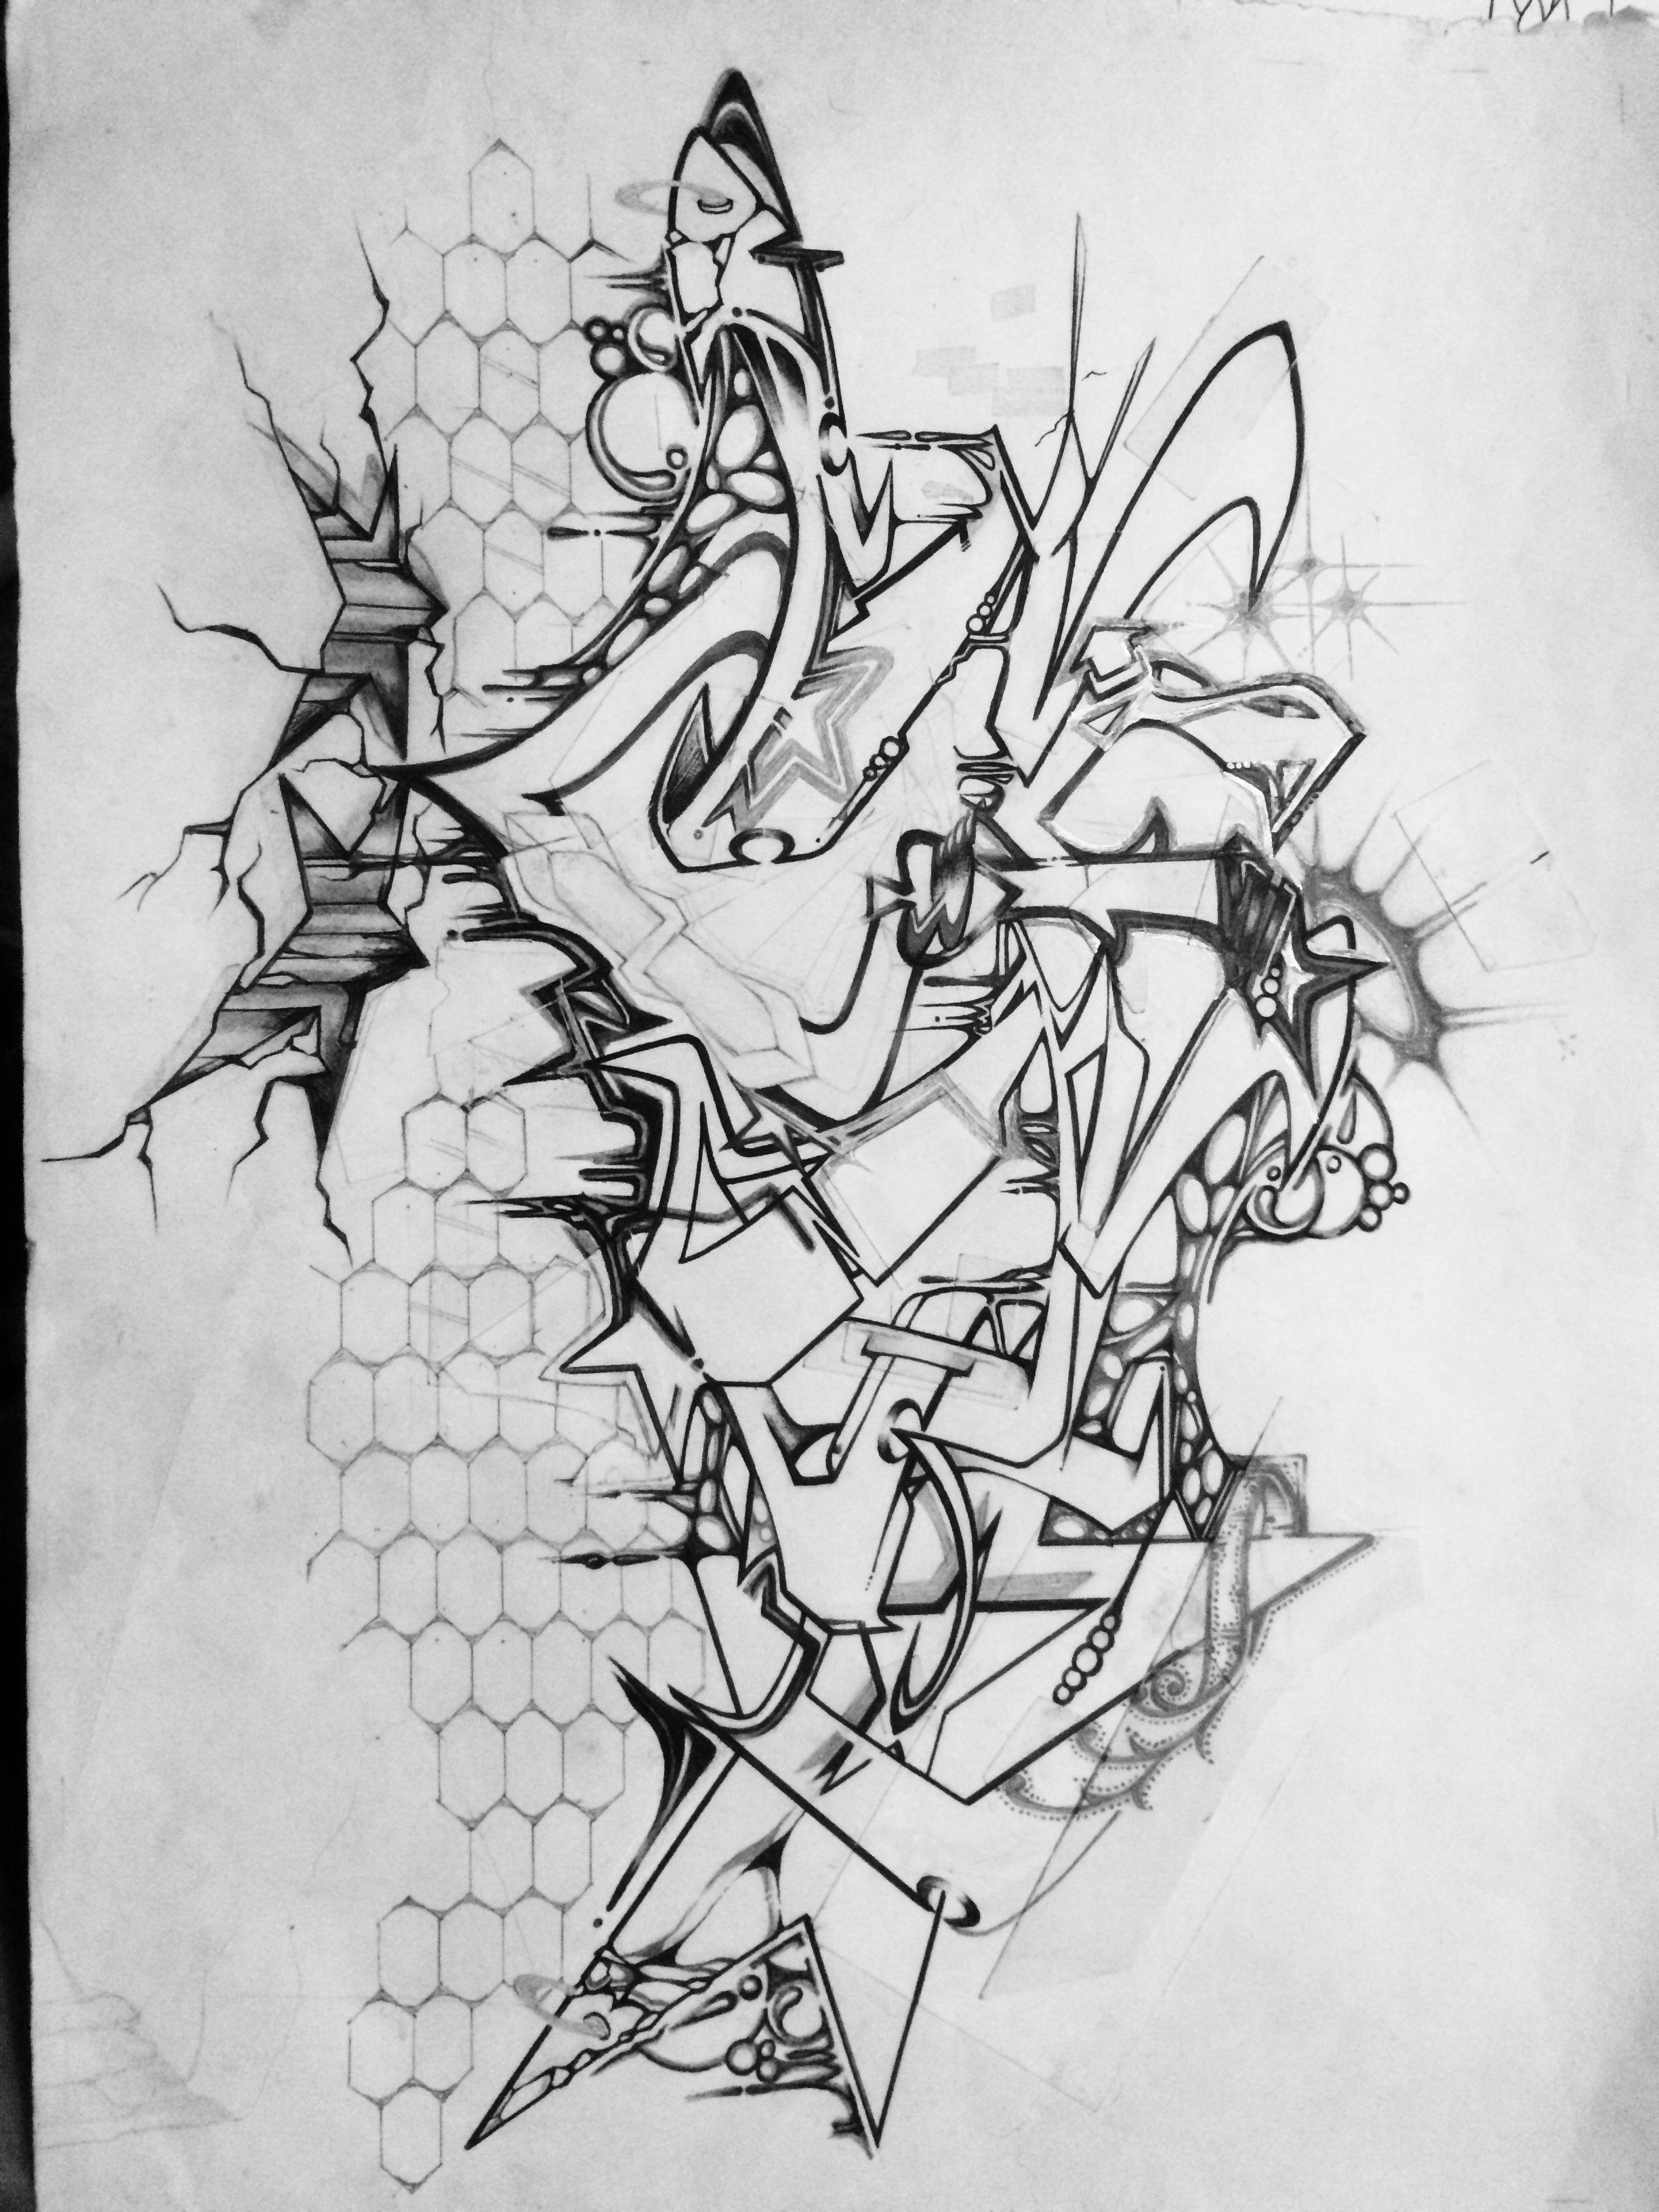 Graffiti alphabet graffiti lettering graffiti art graffiti styles sketch books clutter